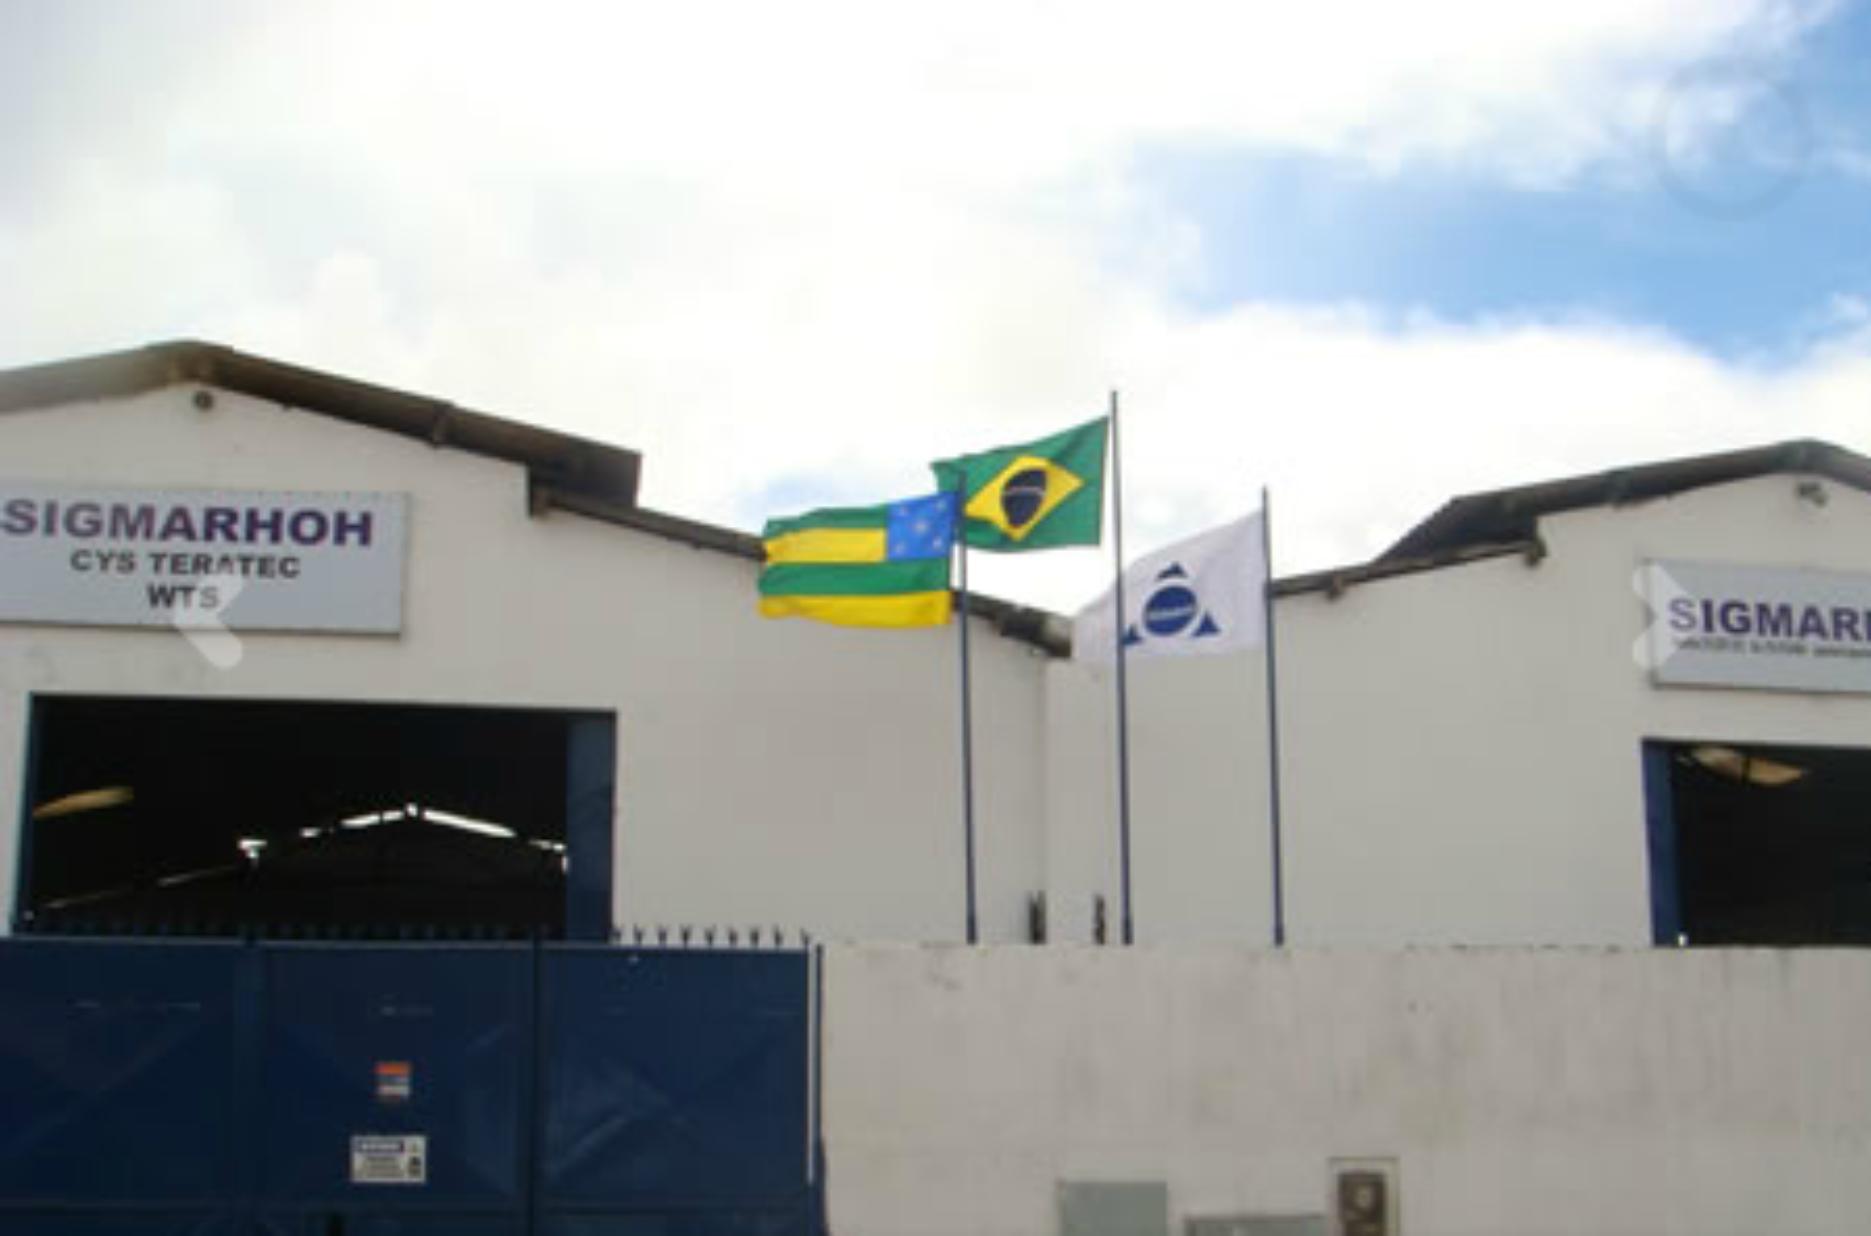 Sigmarhoh do Brasil LTDA.